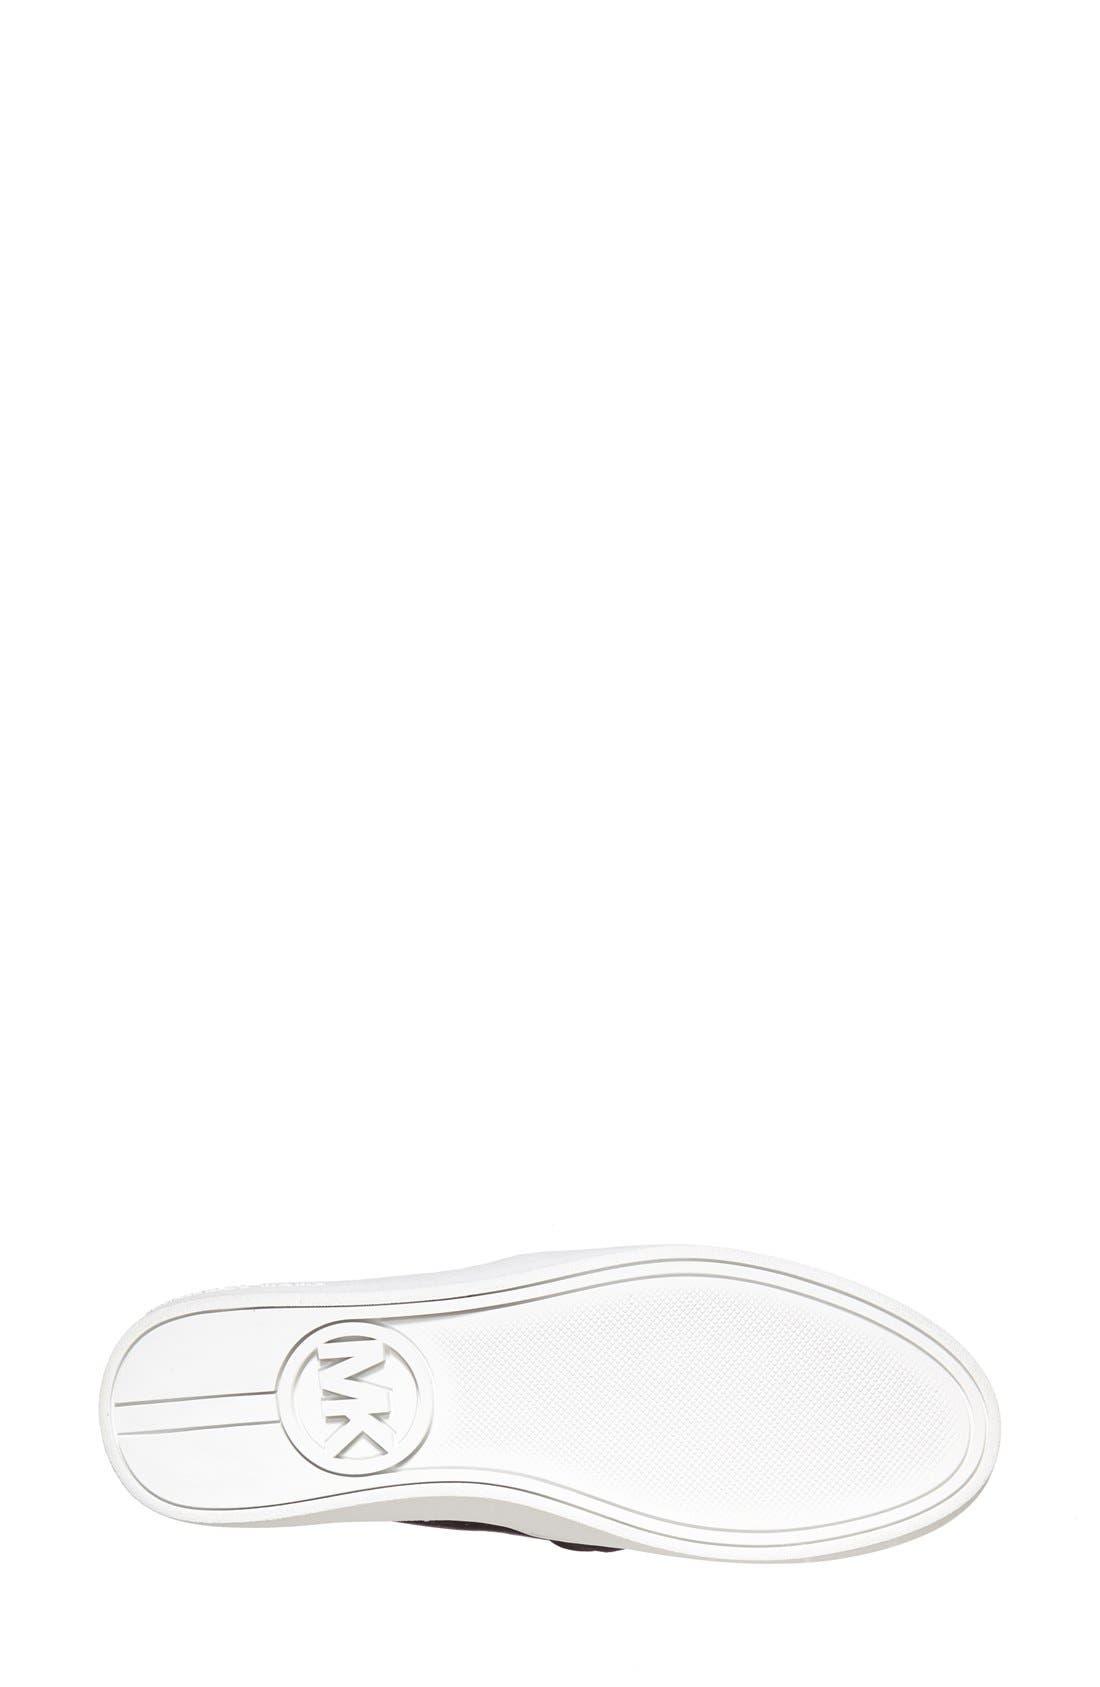 Keaton Slip-On Sneaker,                             Alternate thumbnail 146, color,